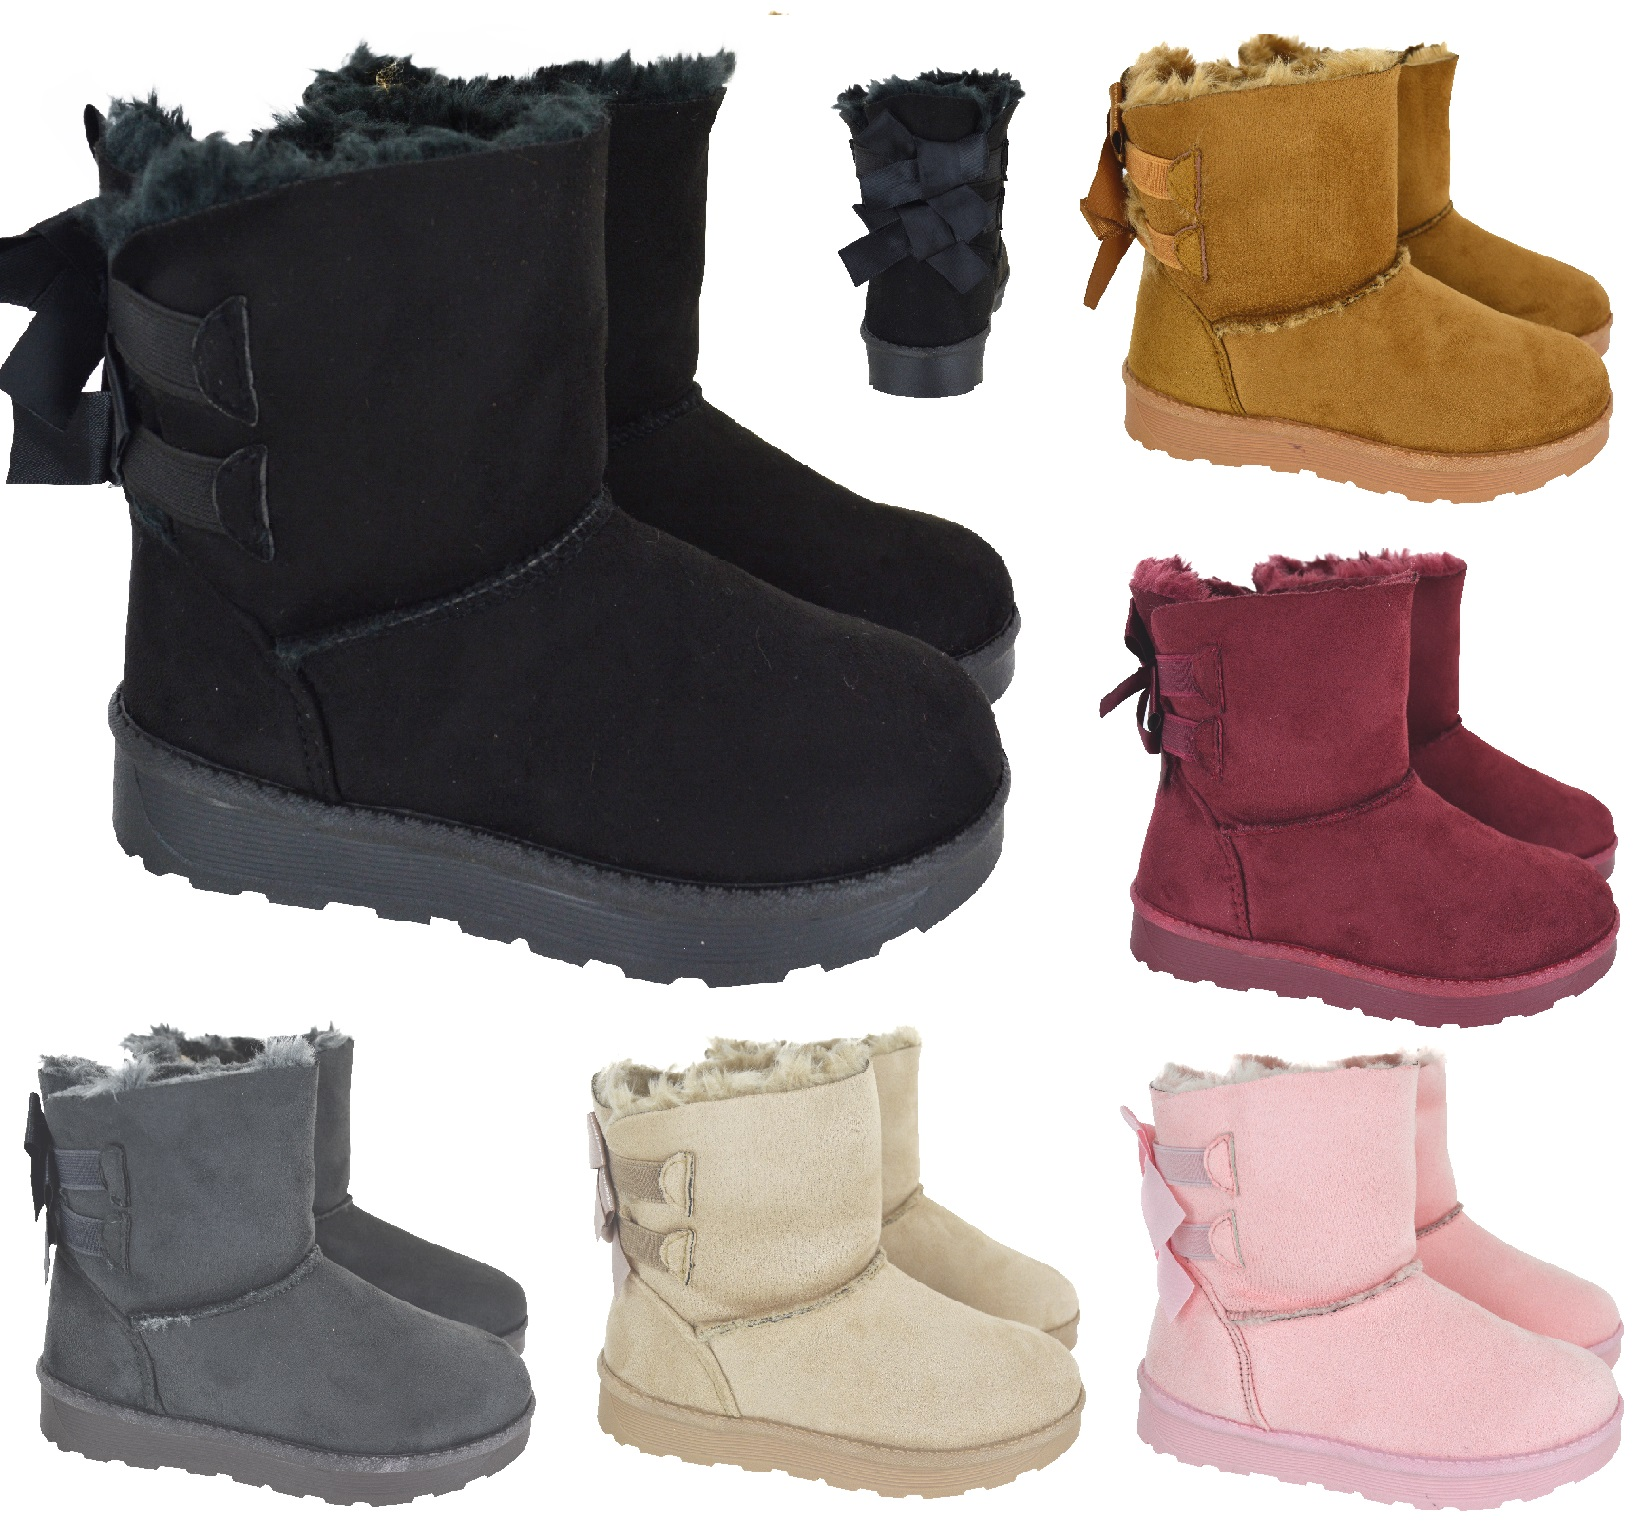 GIRLS KIDS CHILDREN WARM WINTER ANKLE GRIP SOLE FUR LINED SHOES TRAINER BOOTS SZ